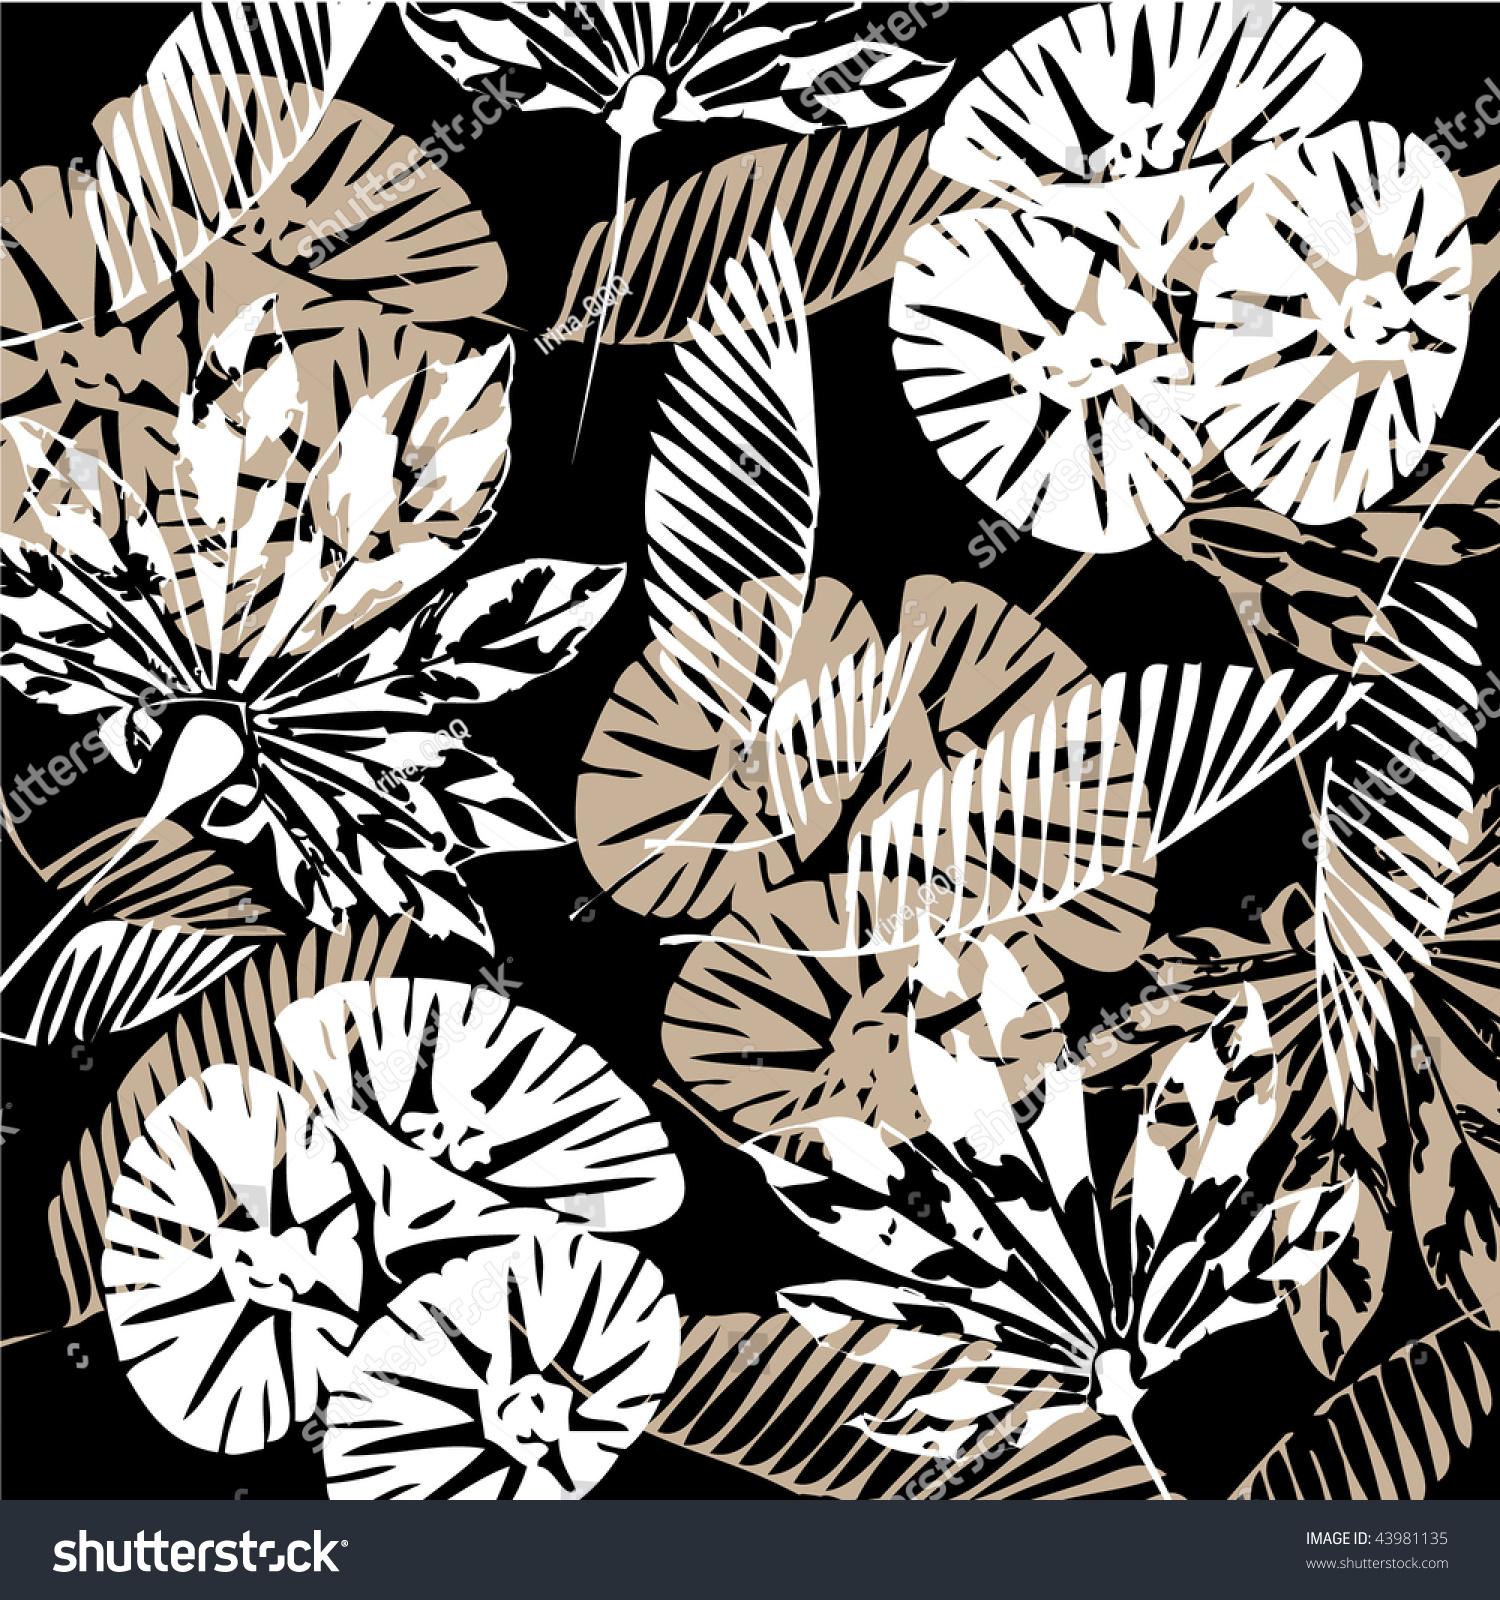 Art Vintage Floral Autumn Black White Stock Vector 2018 43981135